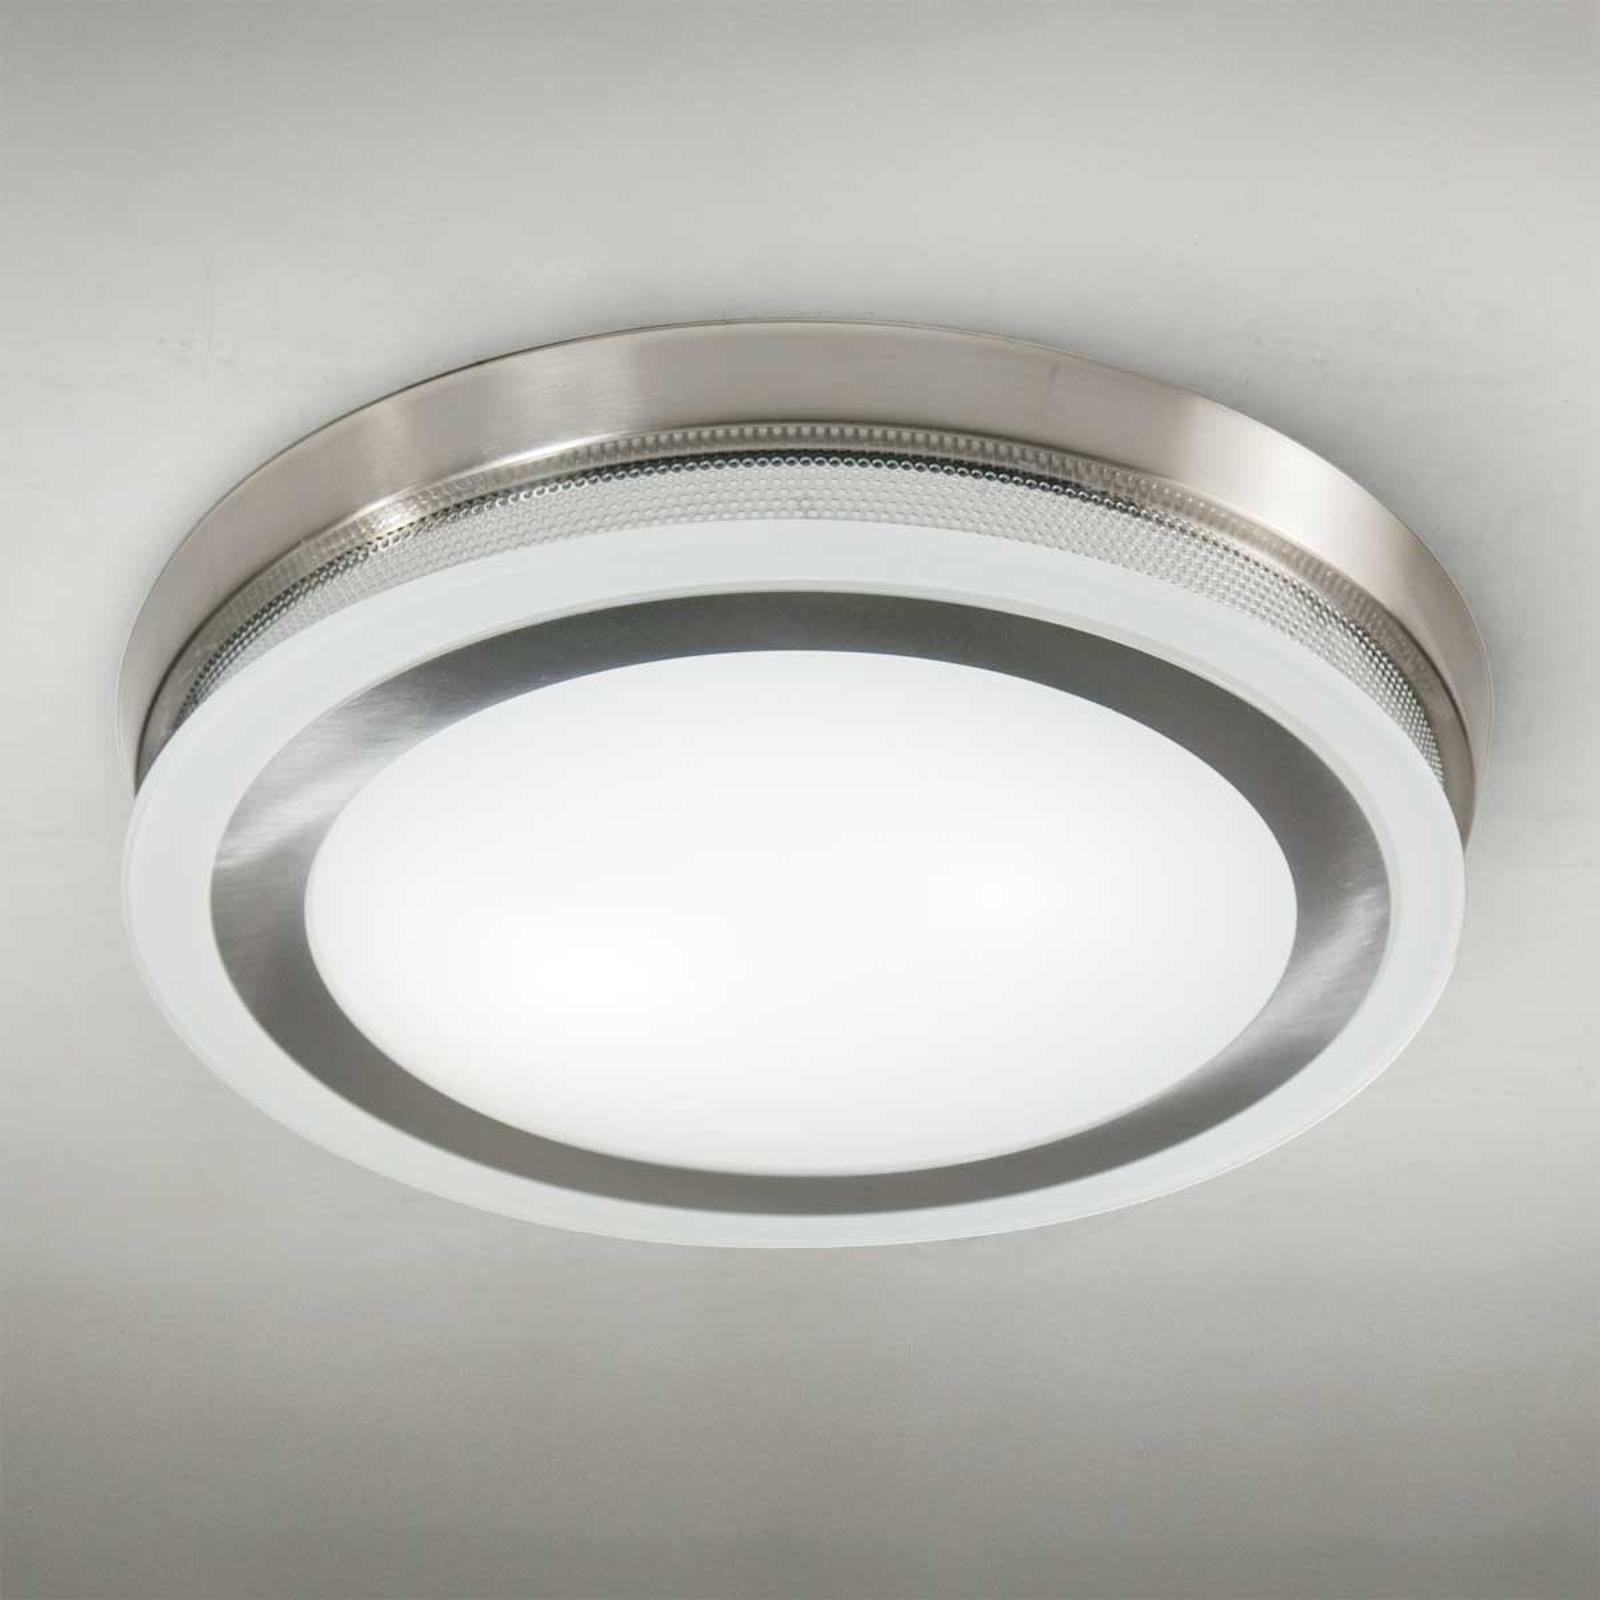 Pyöreä kattovalaisin Ring 9115 43 cm teräs